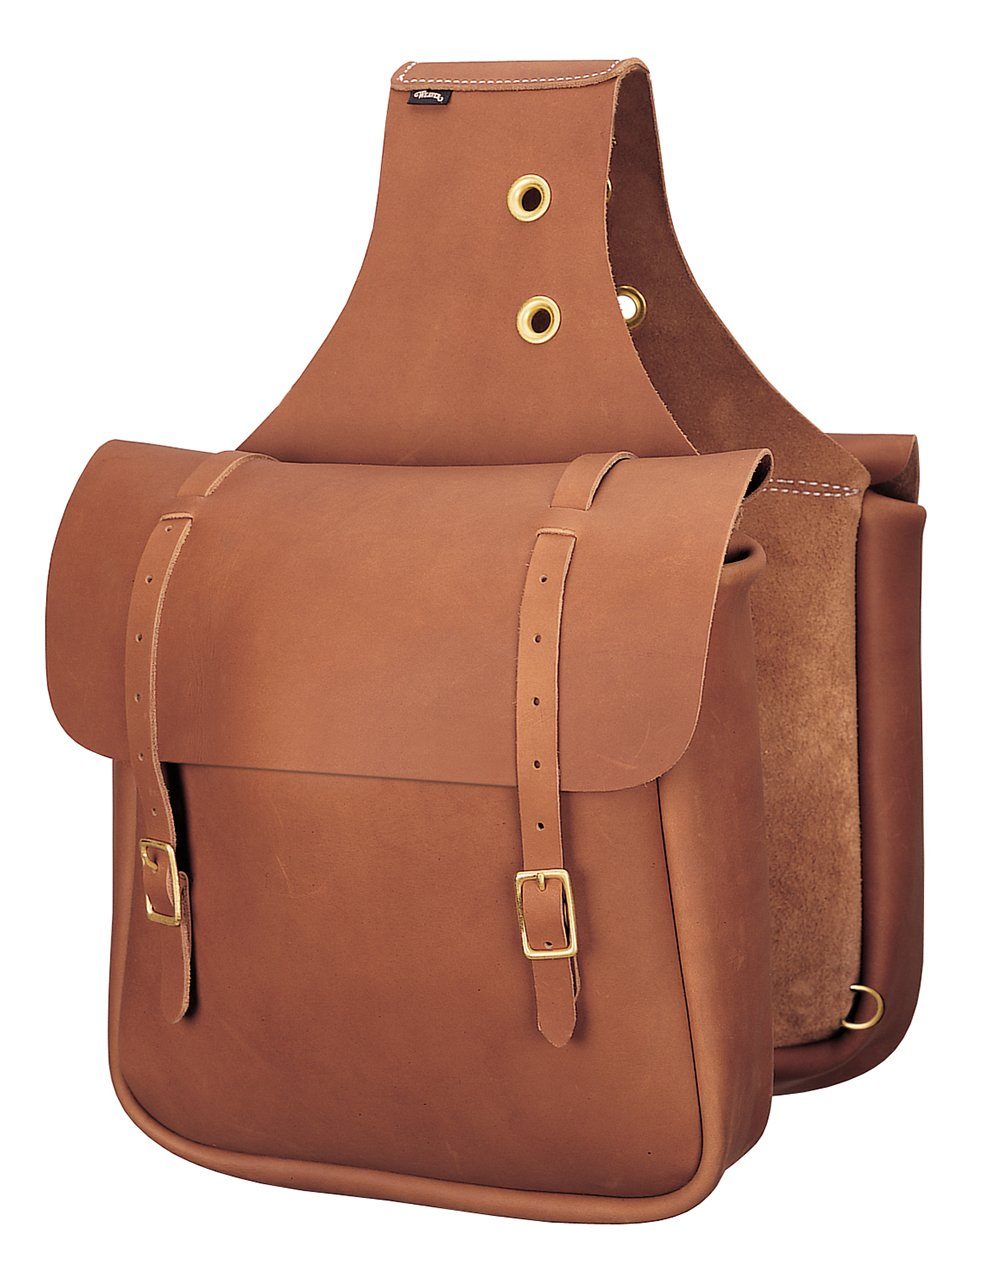 Weaver Leather Chap Leather Saddle Bag